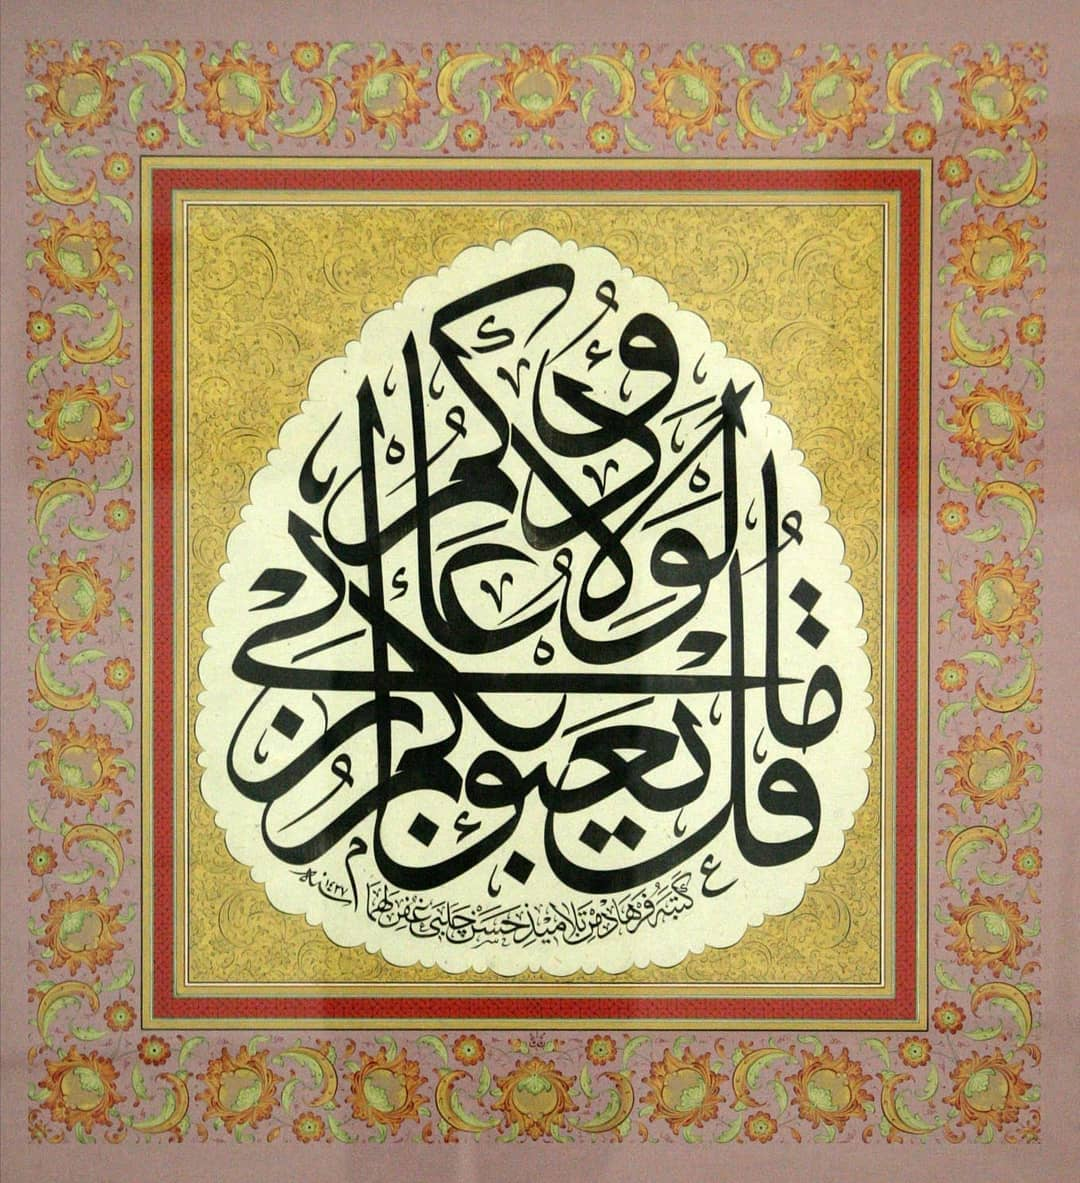 Karya Kaligrafi قل ما يعبؤابكم ربي لو لا دعاؤكم Deki;Duanız olmasa rabbim size niçin kıymet vers…- Ferhat Kurlu